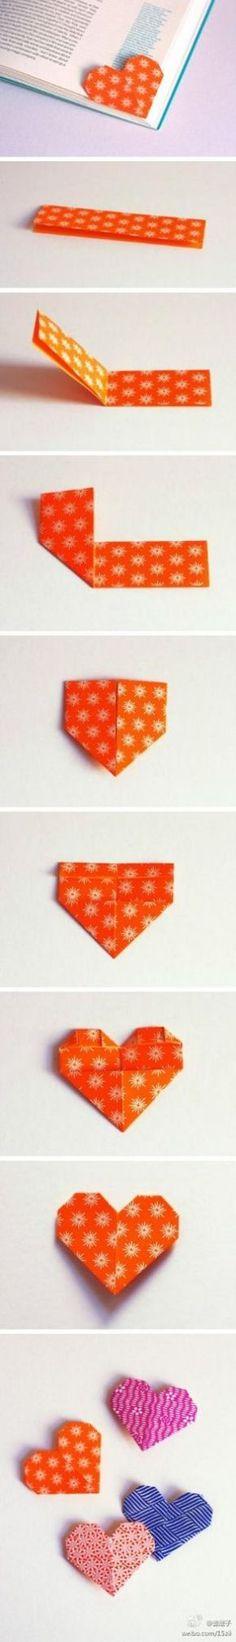 Origami : comment faire un marque page coeur